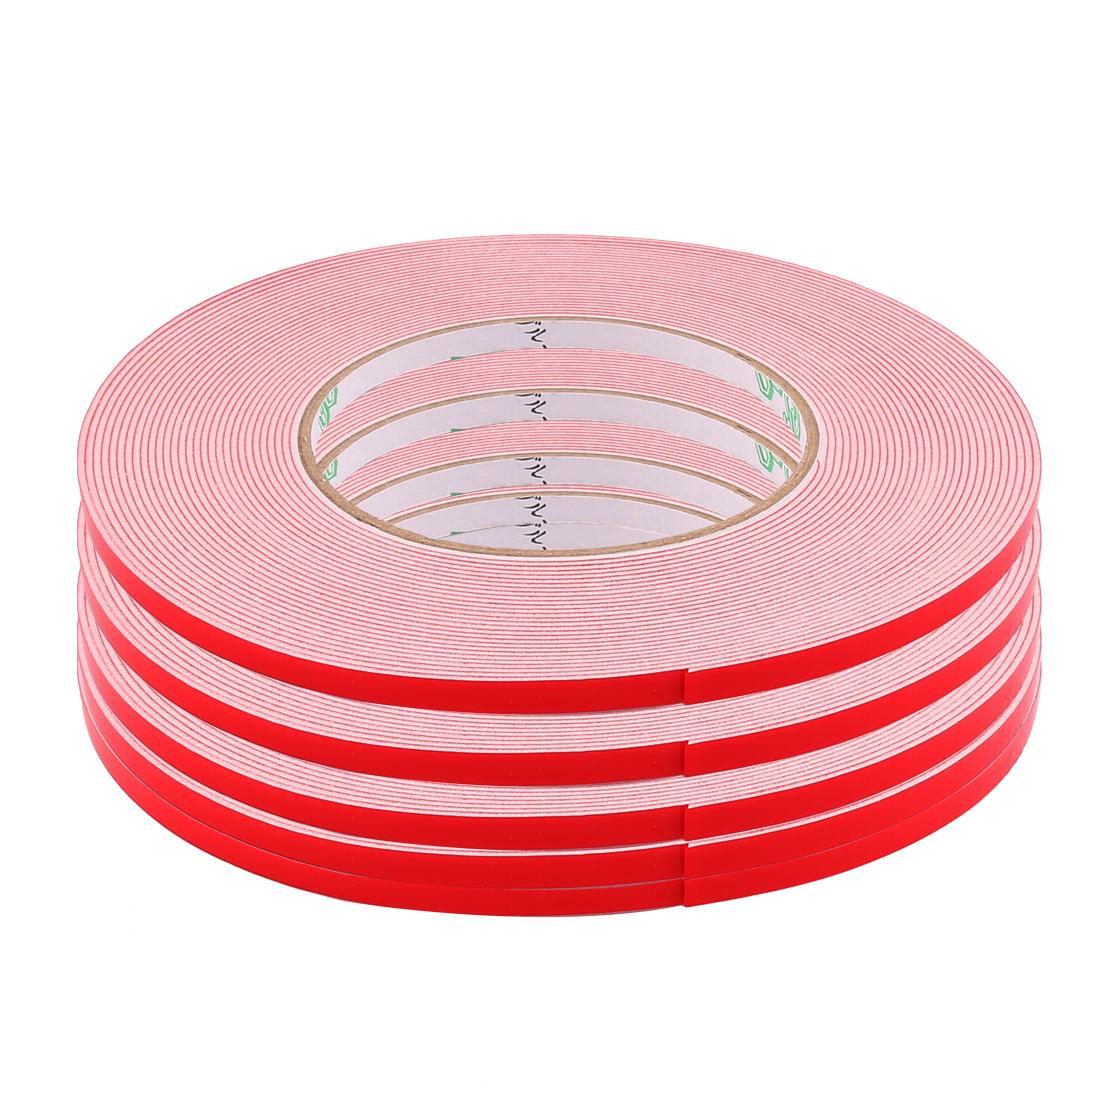 5 Pcs 5x1mm Dual Sided Sponge Tape Adhesive Sticker Foam Glue Strip Sealing 10M